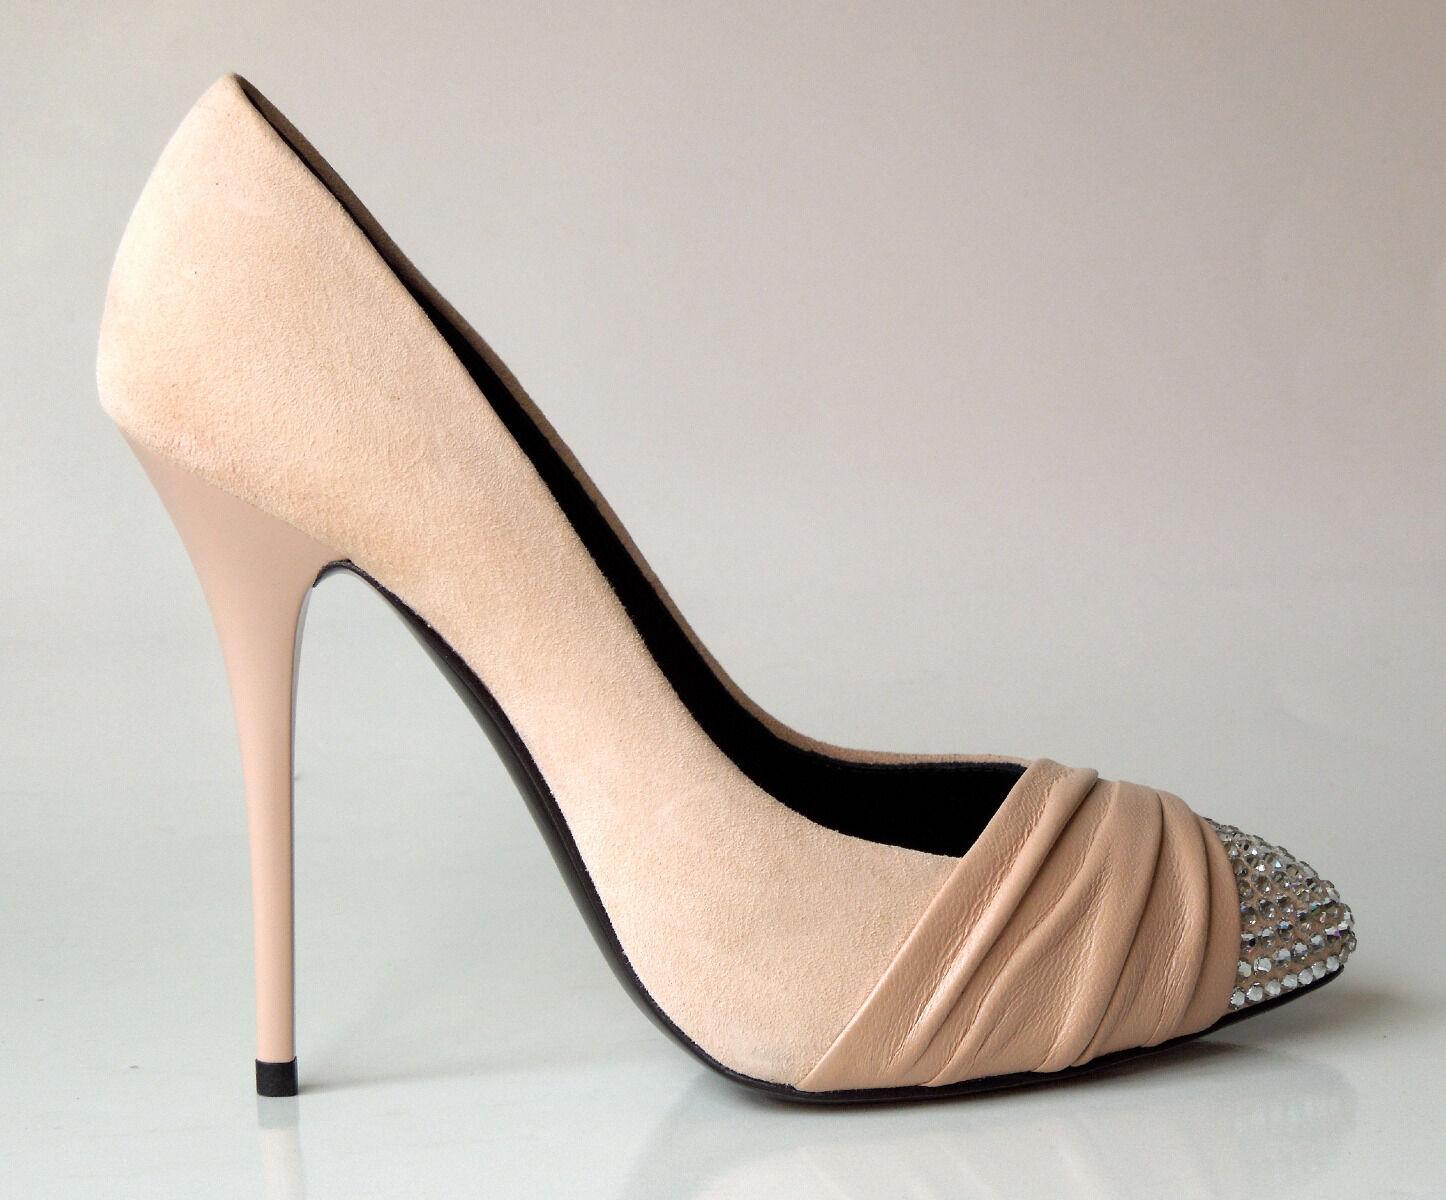 tutti i beni sono speciali New  1195 Giuseppe ZANOTTI nude suede JEWELED TOE TOE TOE platforms scarpe - AMAZING  tempo libero